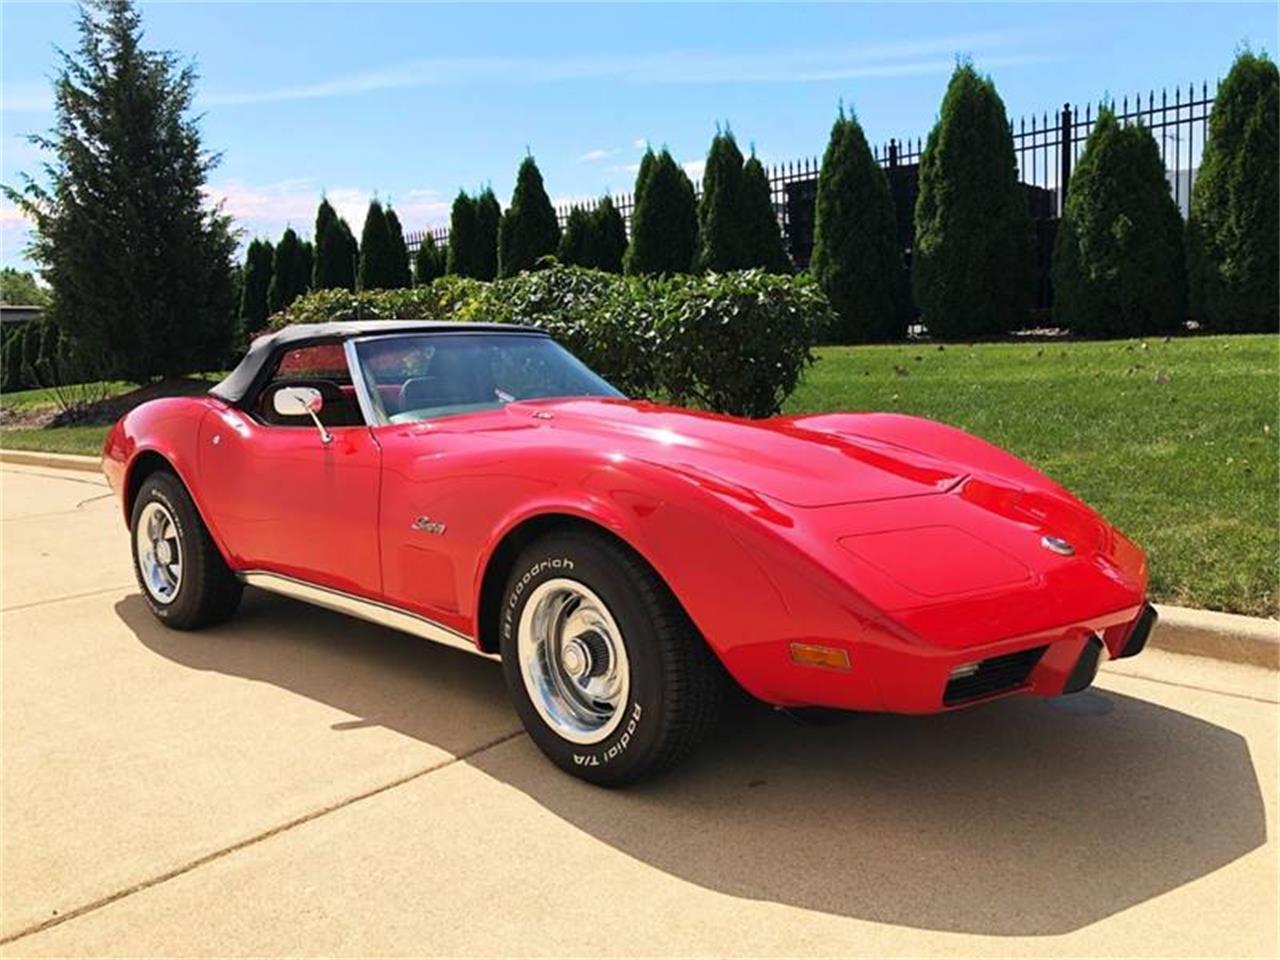 For Sale: 1975 Chevrolet Corvette in Burr Ridge, Illinois